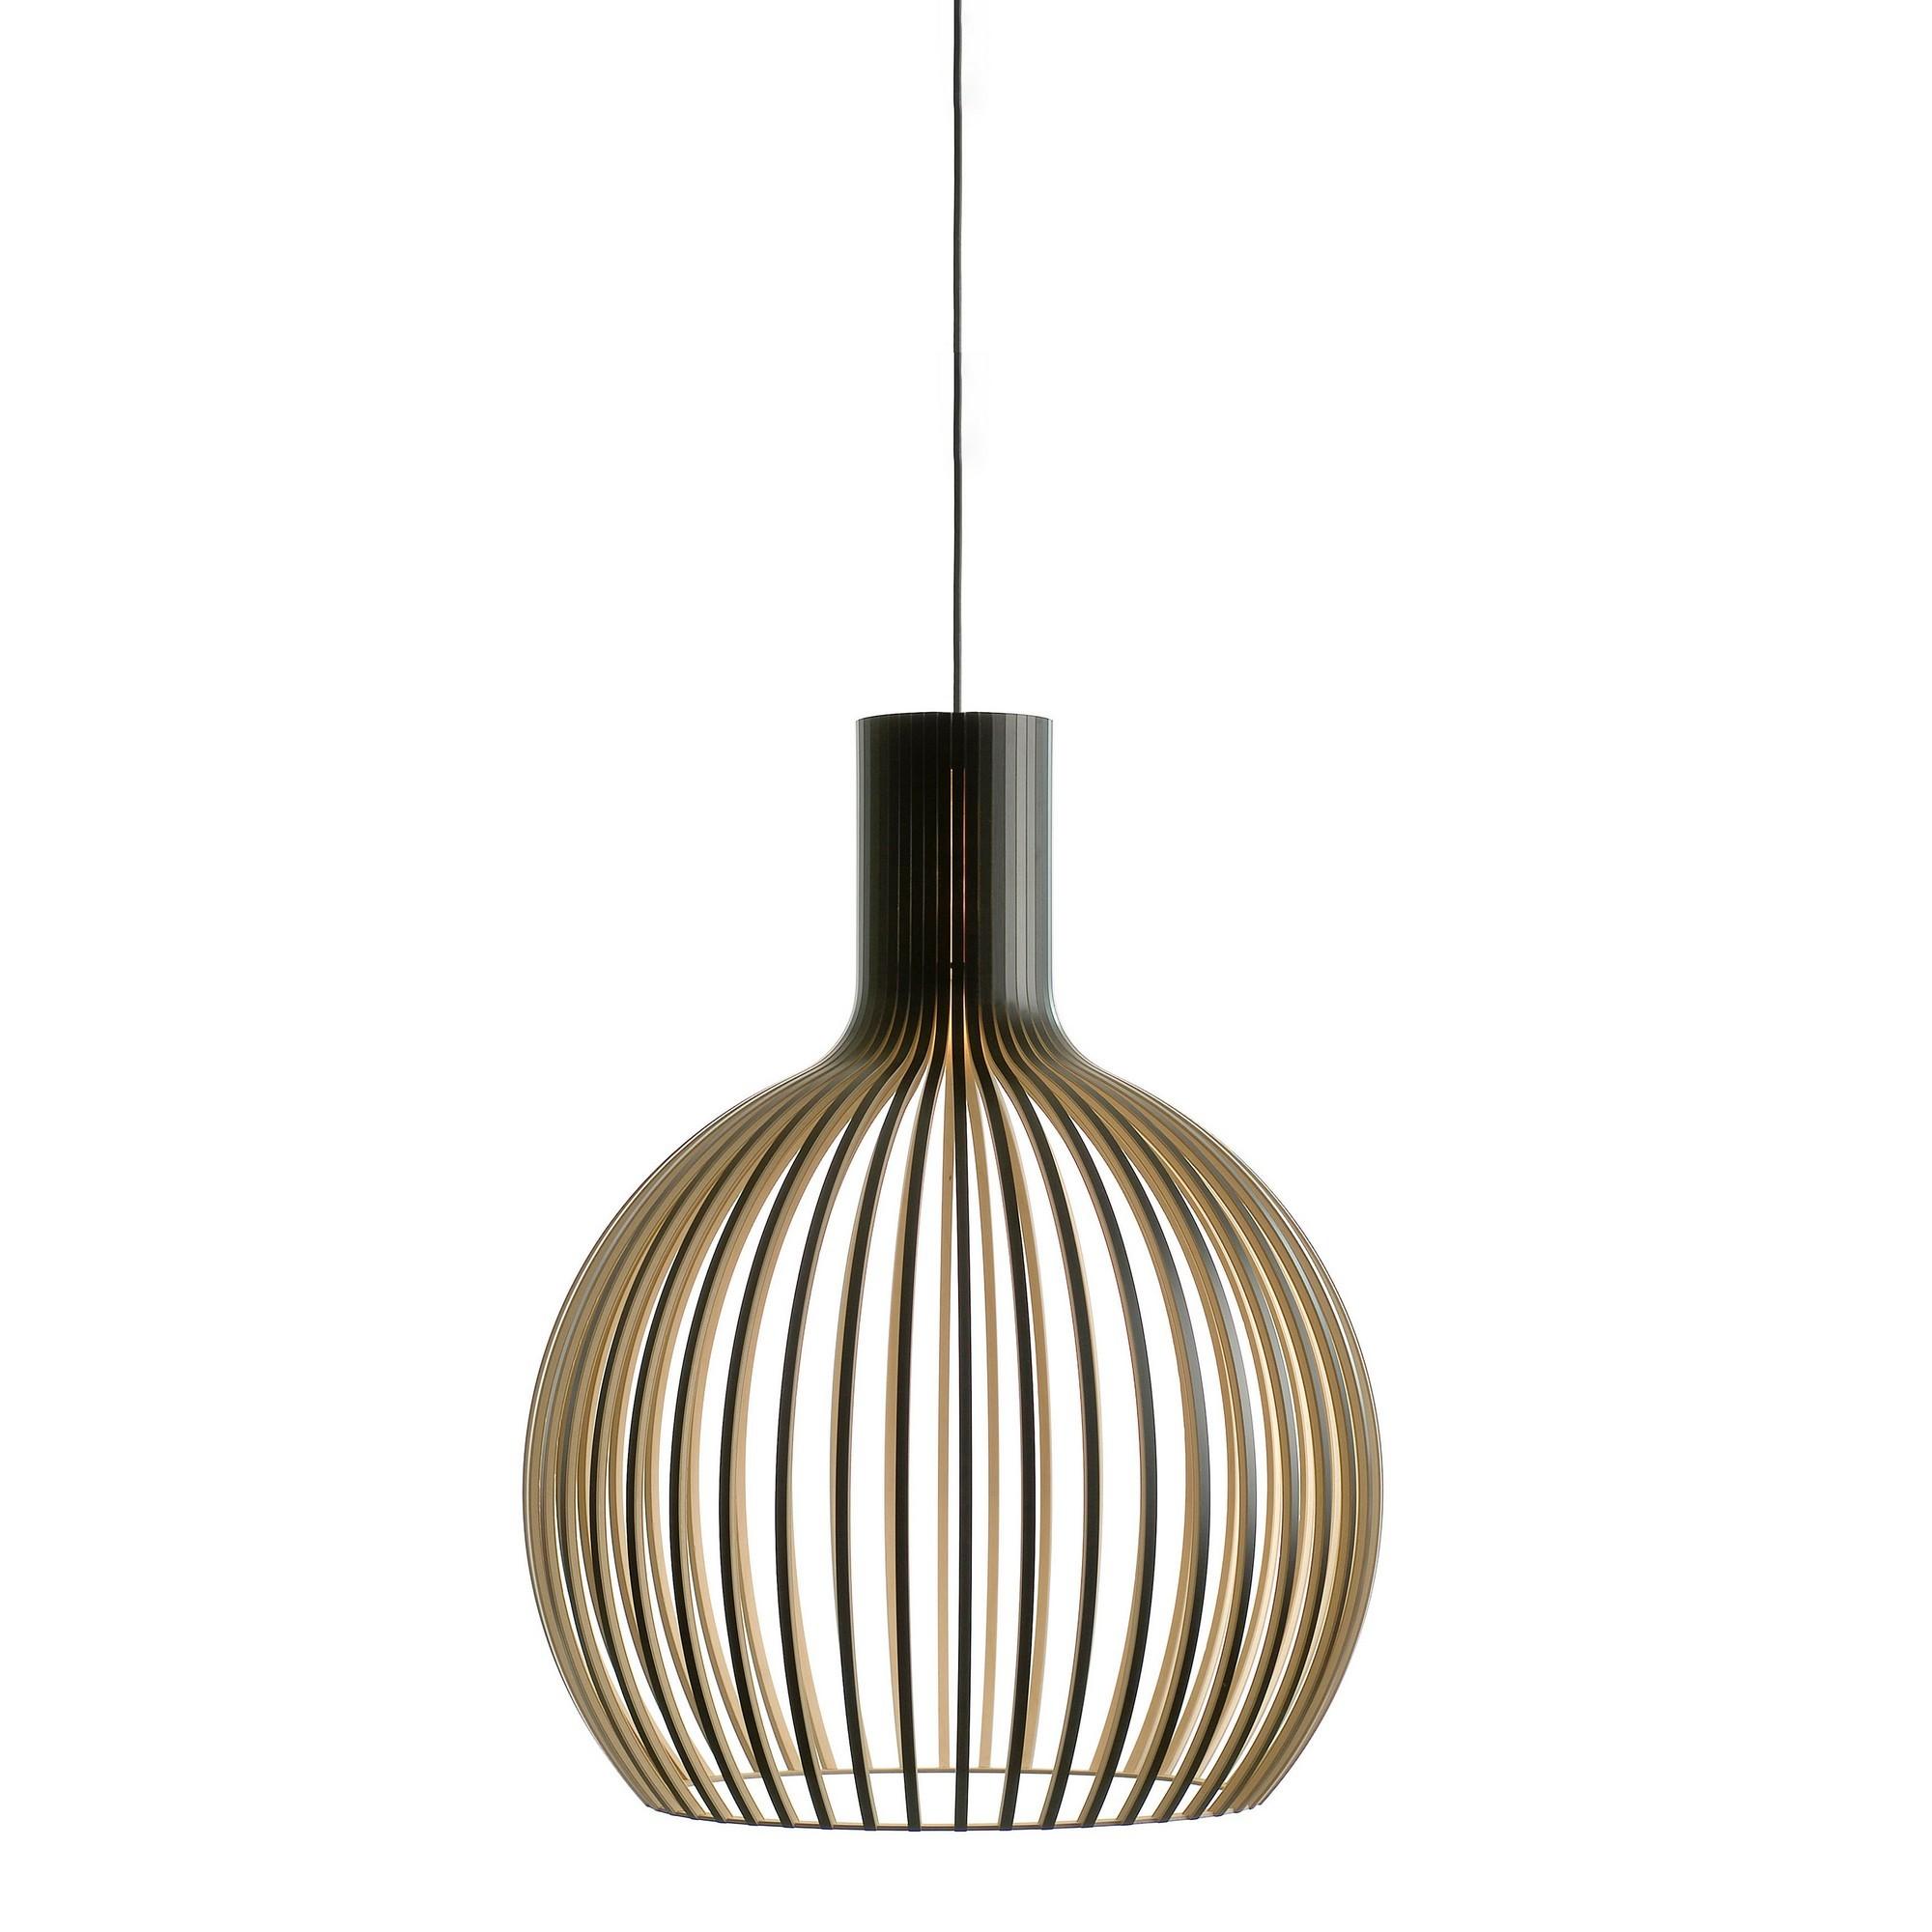 Replica Seppo Koho Octo Wooden Pendant Light, Medium, Black